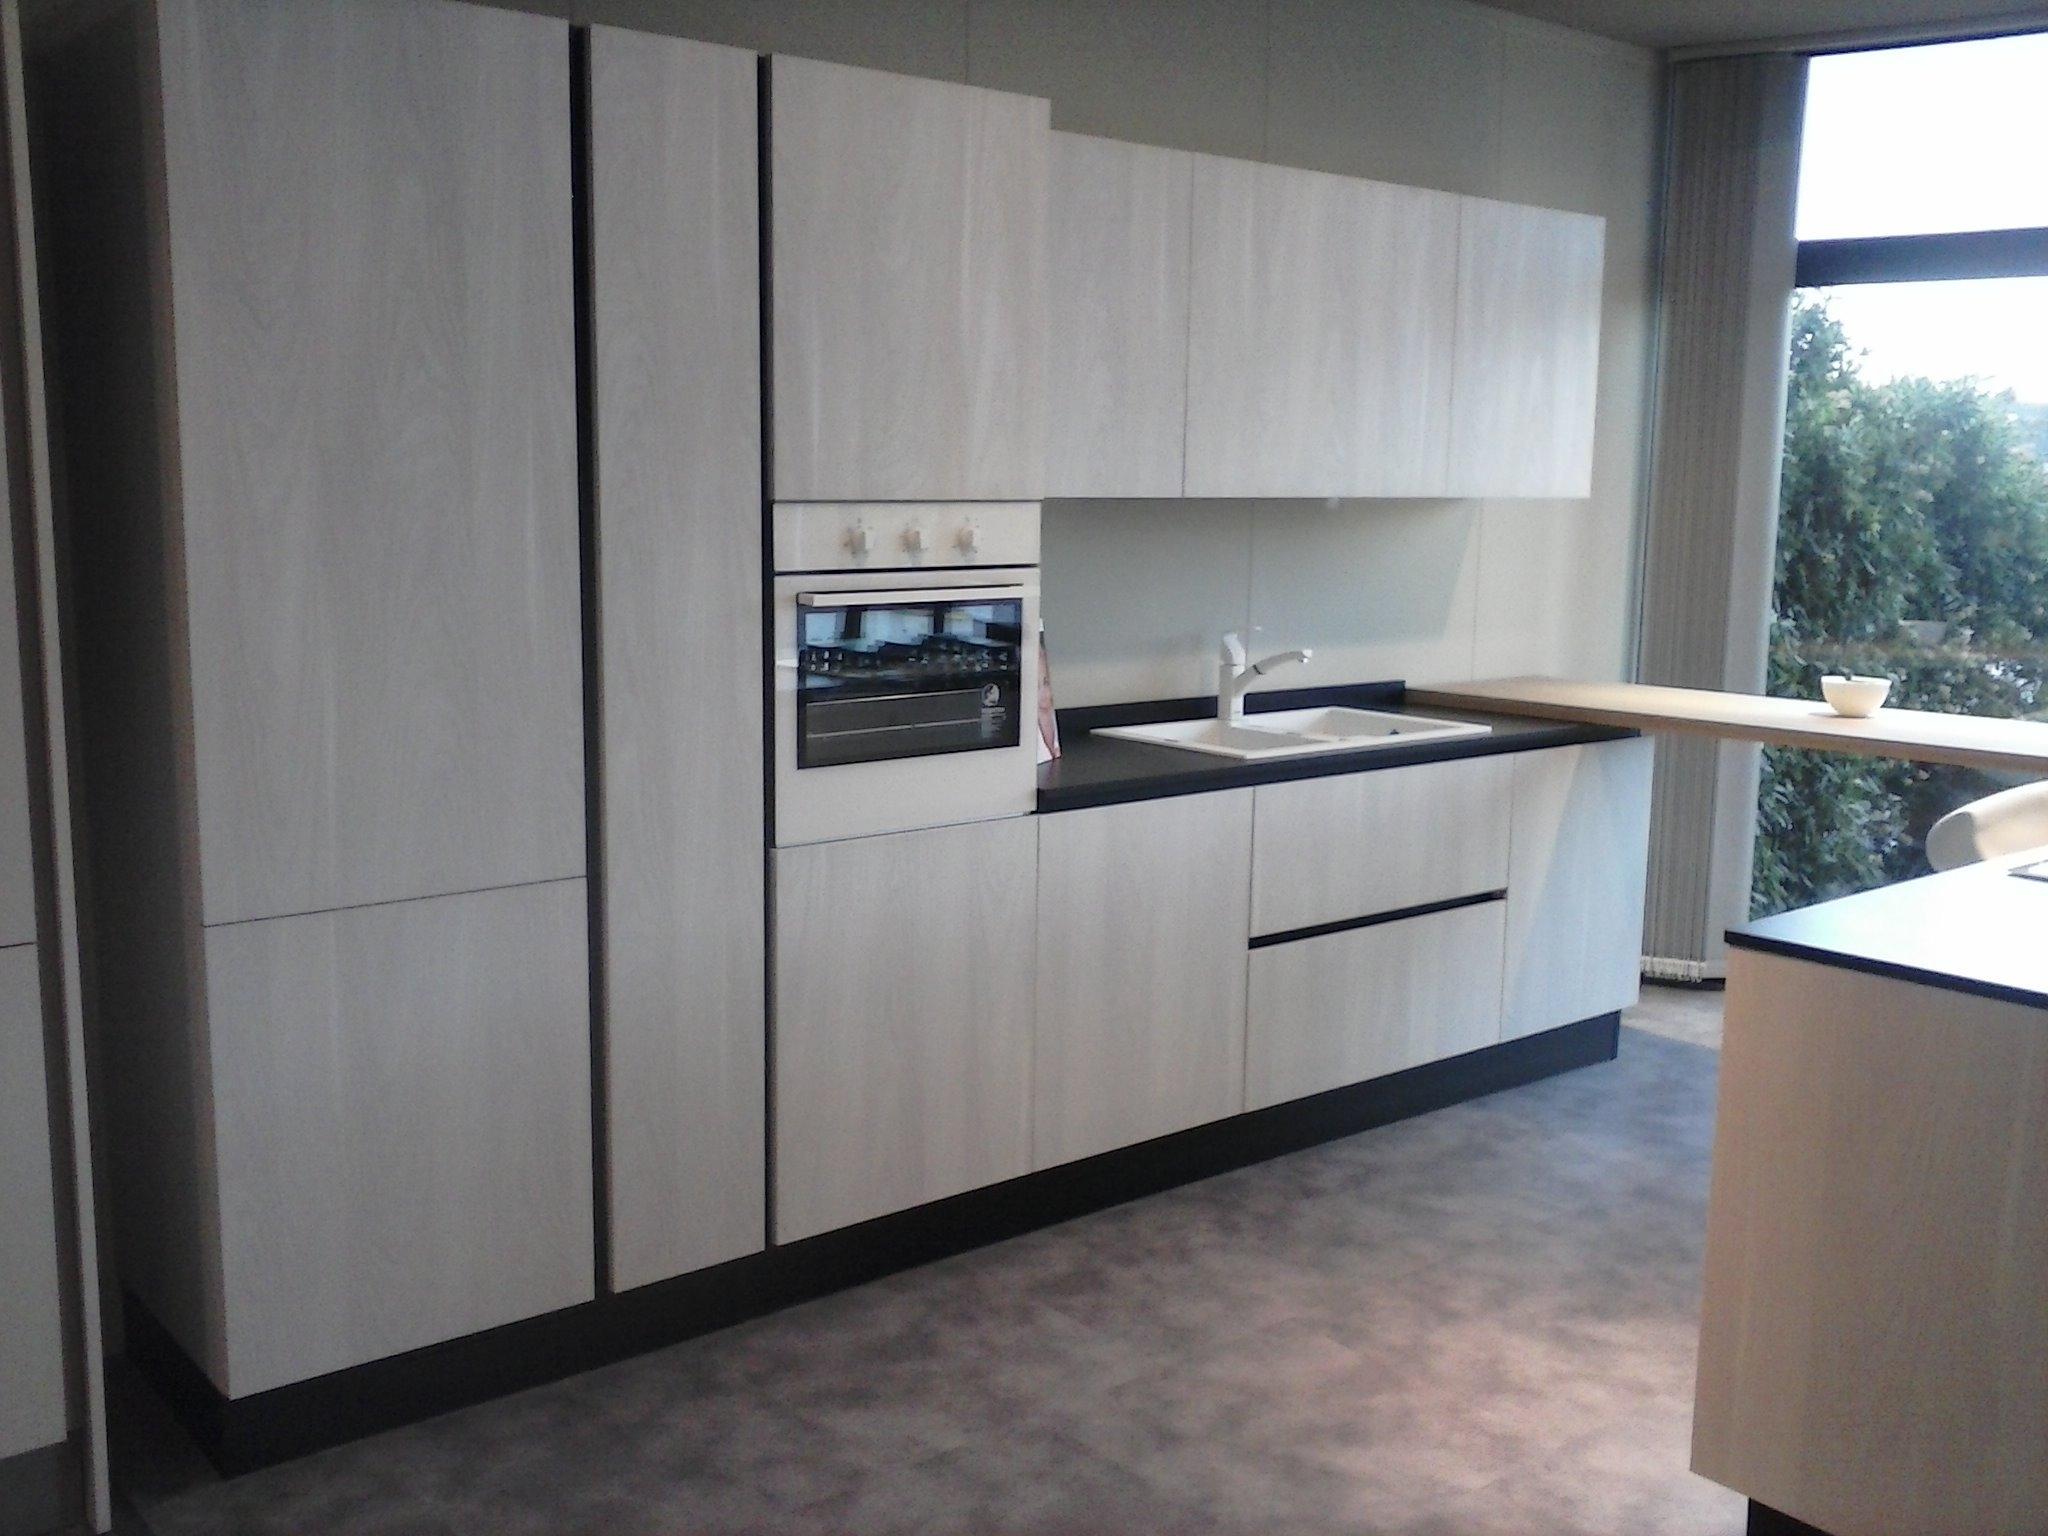 Colonna frigo e forno latest colonna frigo e colonna forno con microonde rex in questa invece - Cucine senza frigo ...